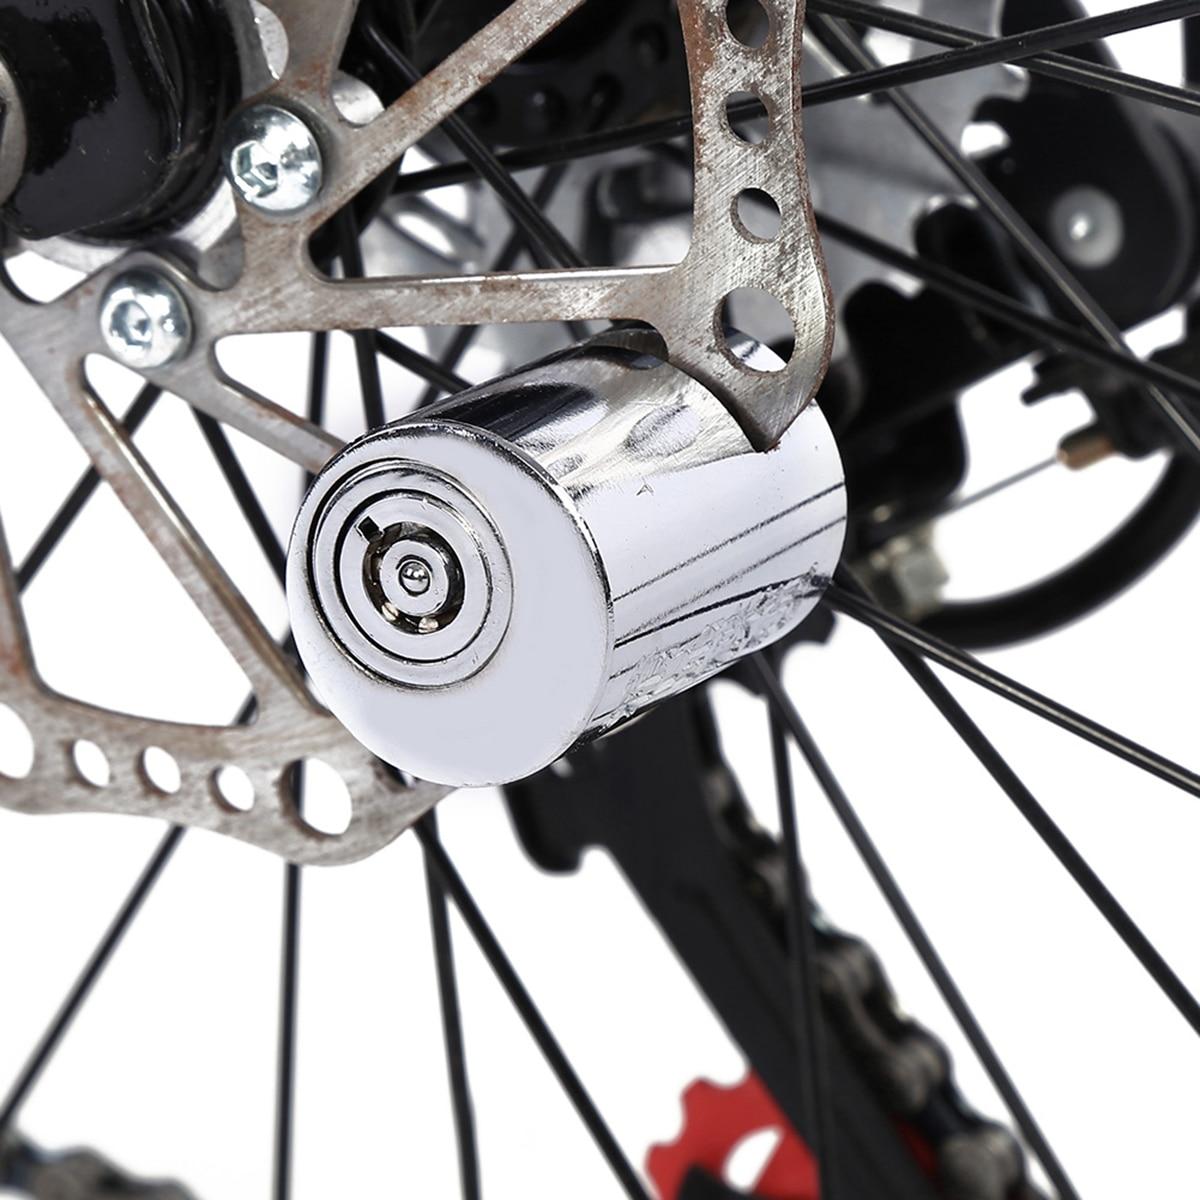 Bloqueo de bicicleta antirrobo Mini candado de seguridad para bicicletas, bloqueo de freno de disco de rueda para motocicleta o bicicleta eléctrica